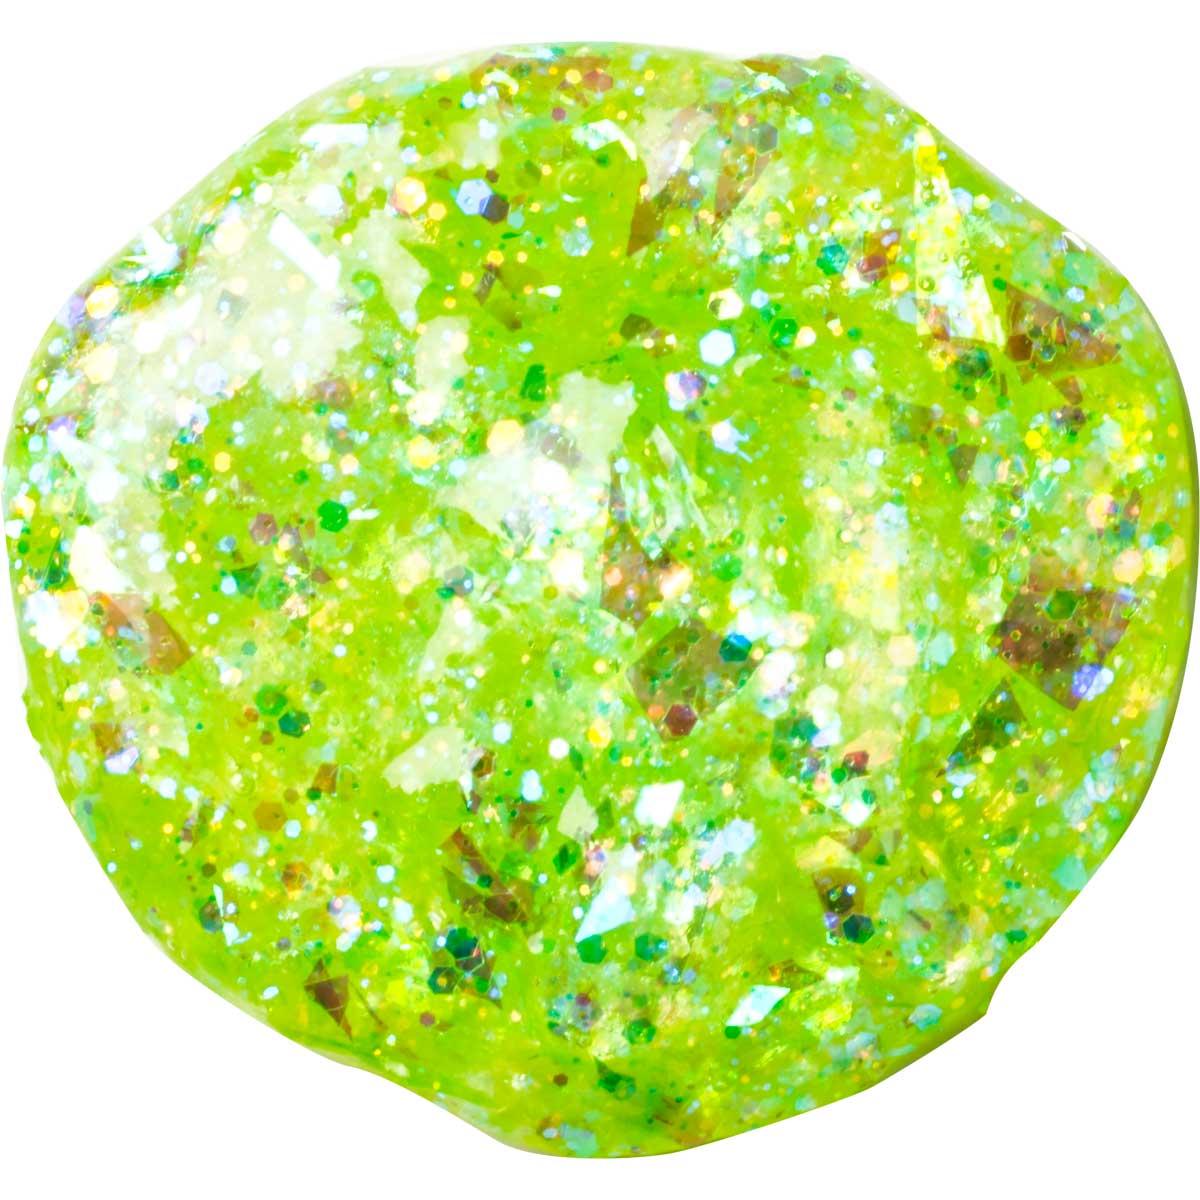 FolkArt ® Glitterific™ Acrylic Paint - Neon Lime, 2 oz.